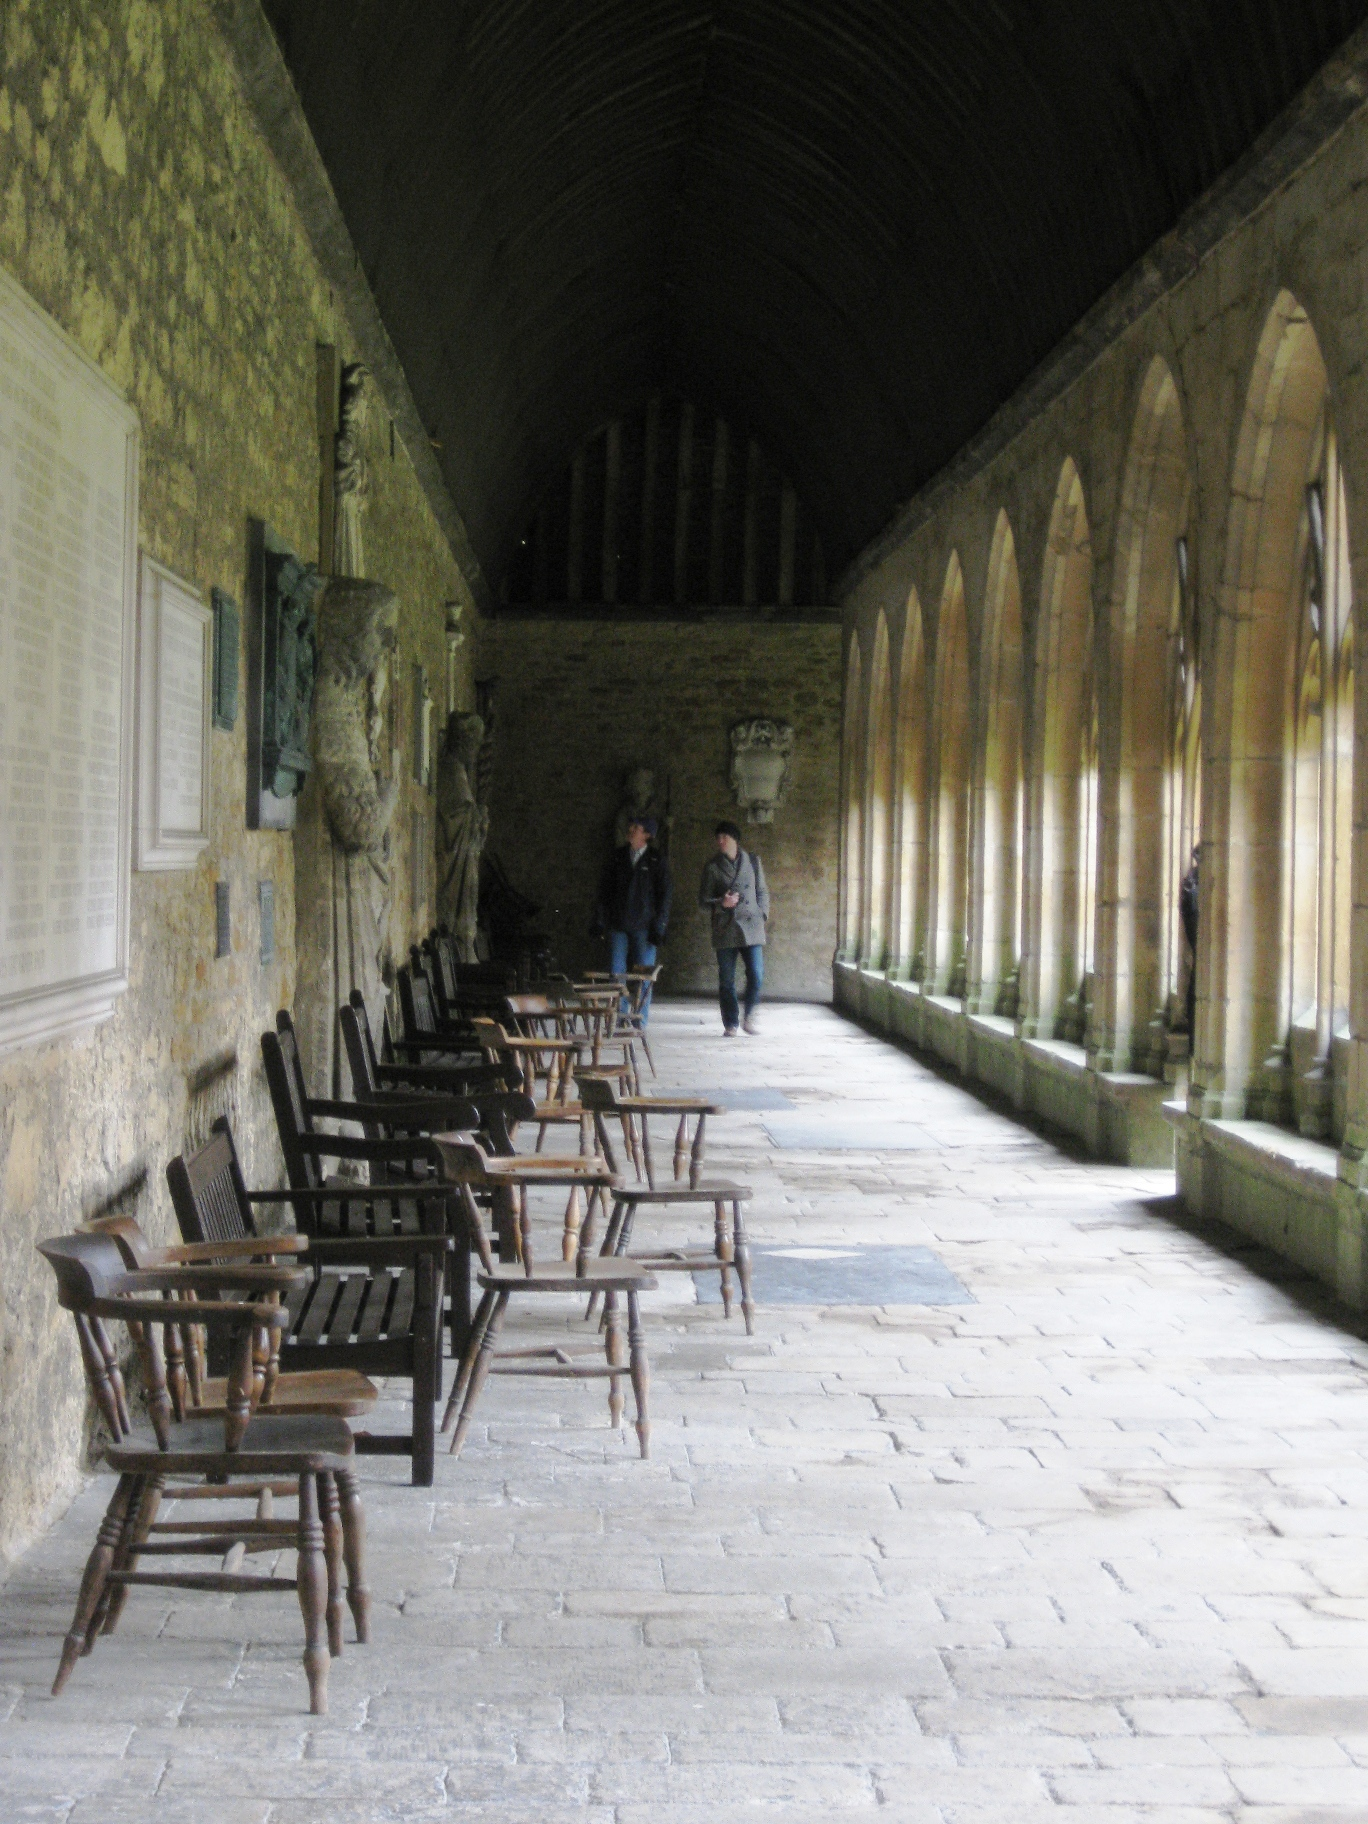 cloisterway